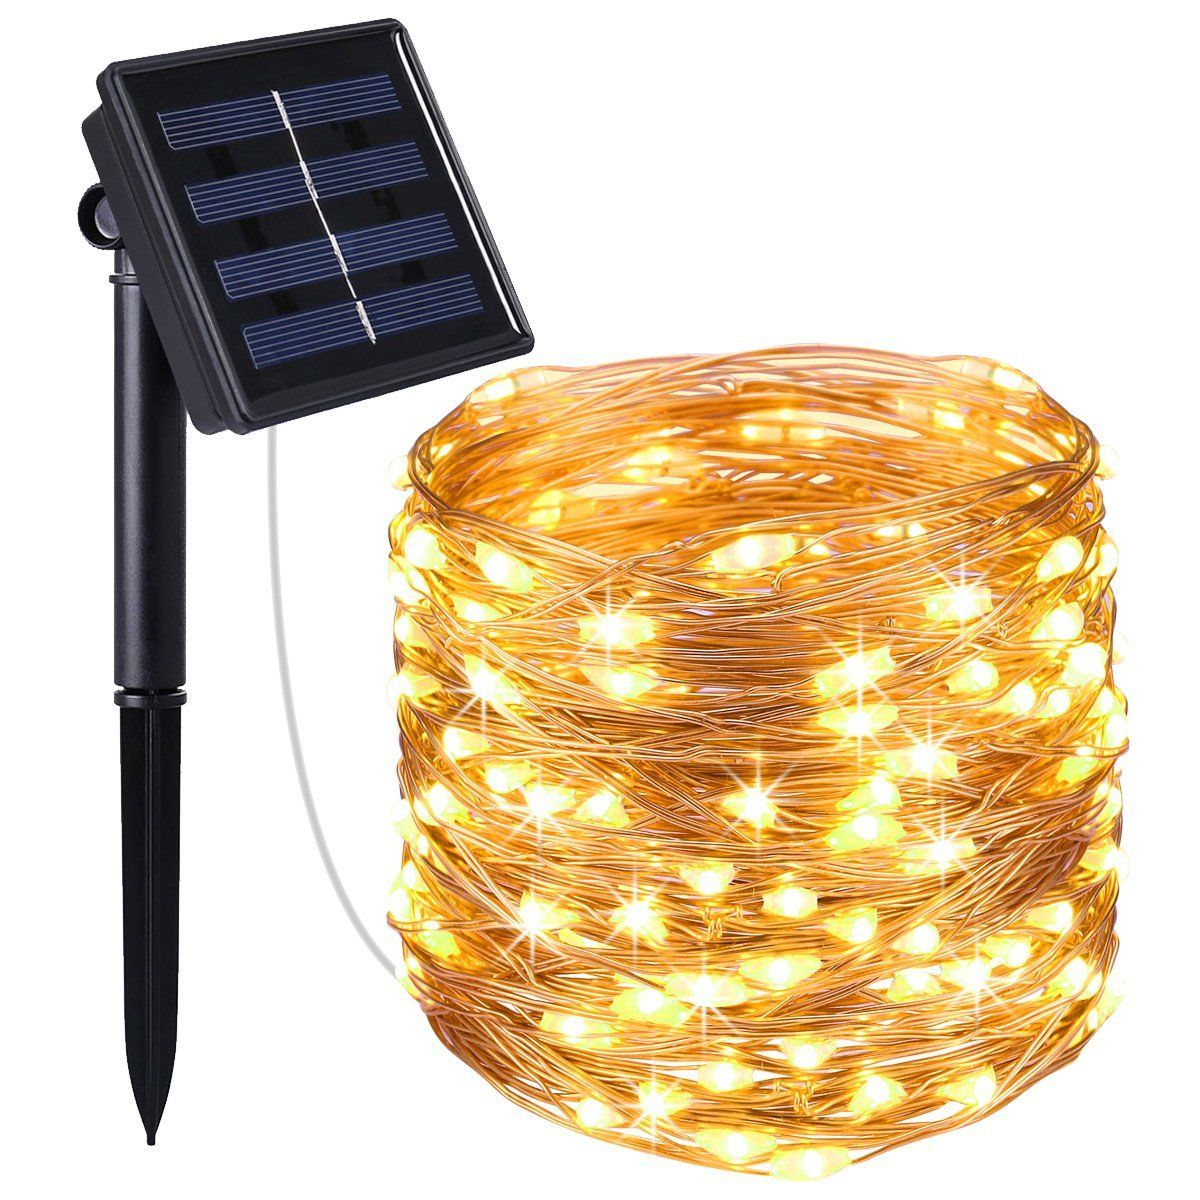 Amazon amir solar powered string lights 100 led copper wire amazon amir solar powered string lights 100 led copper wire lights parisarafo Images